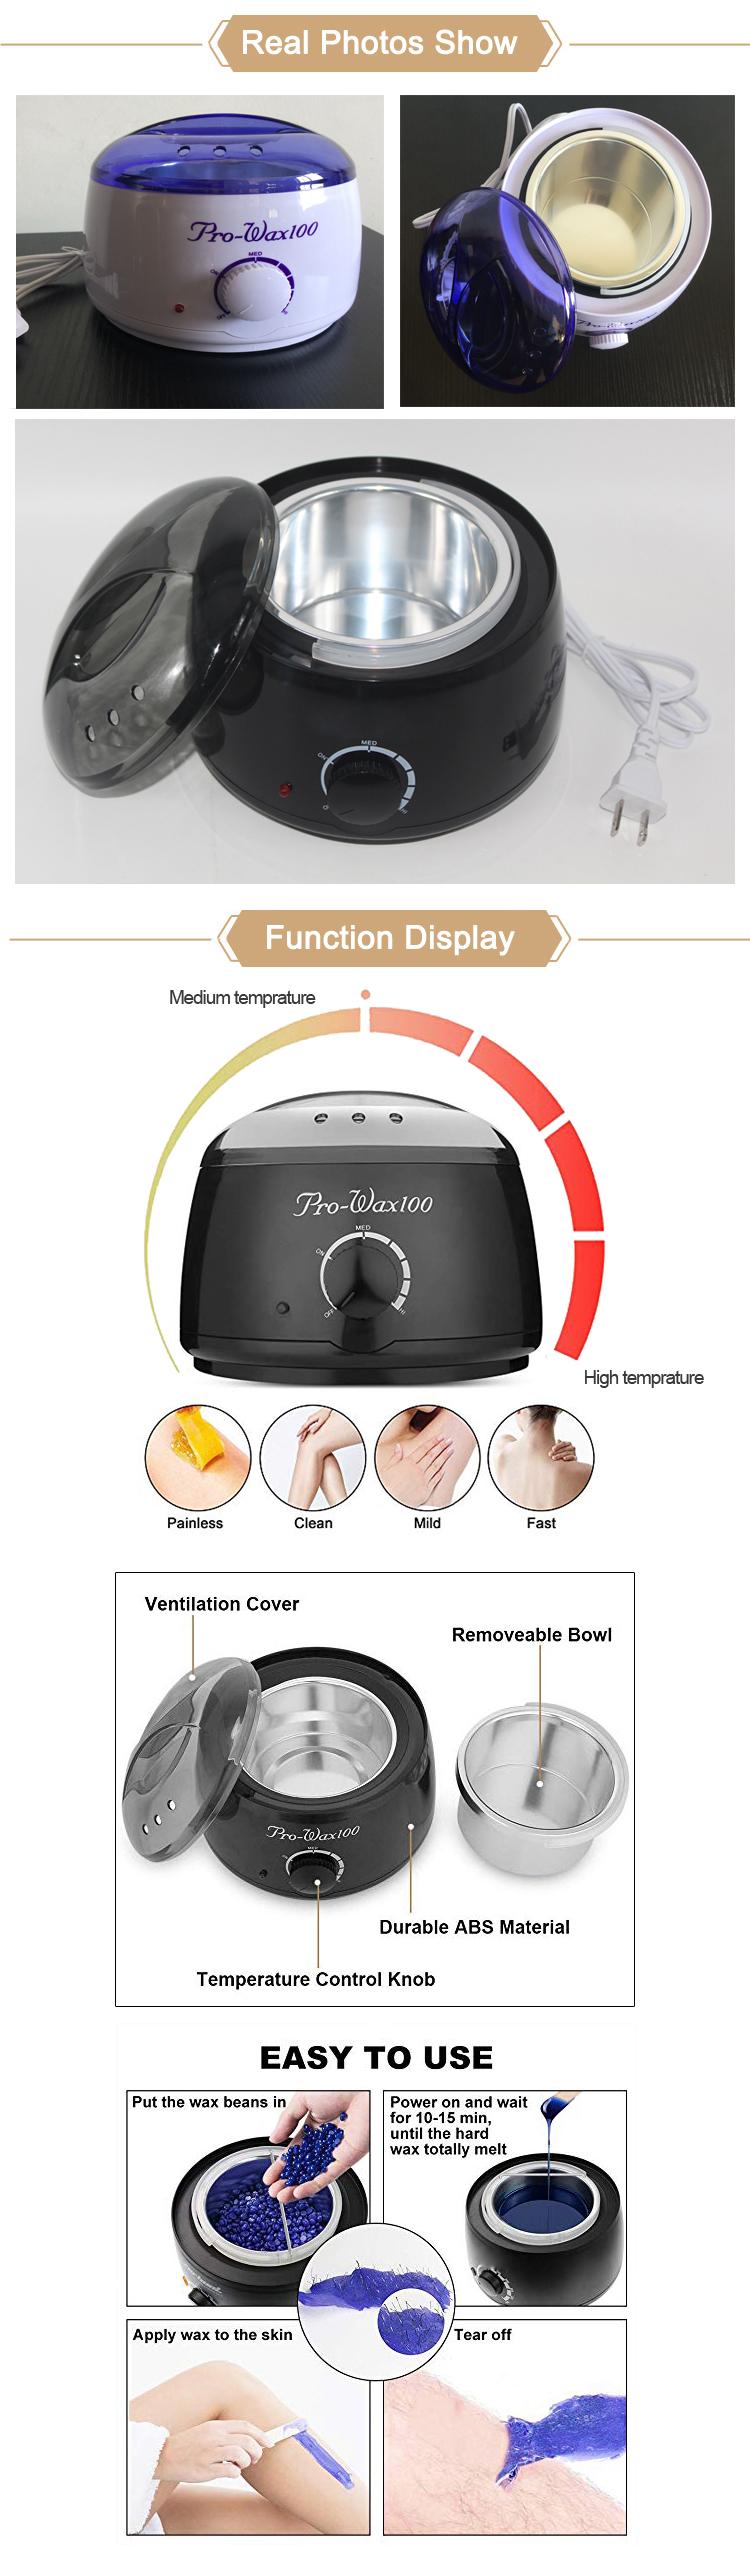 2018 Professional Pro Wax 100 Wax Warmer Heater Hair Remover